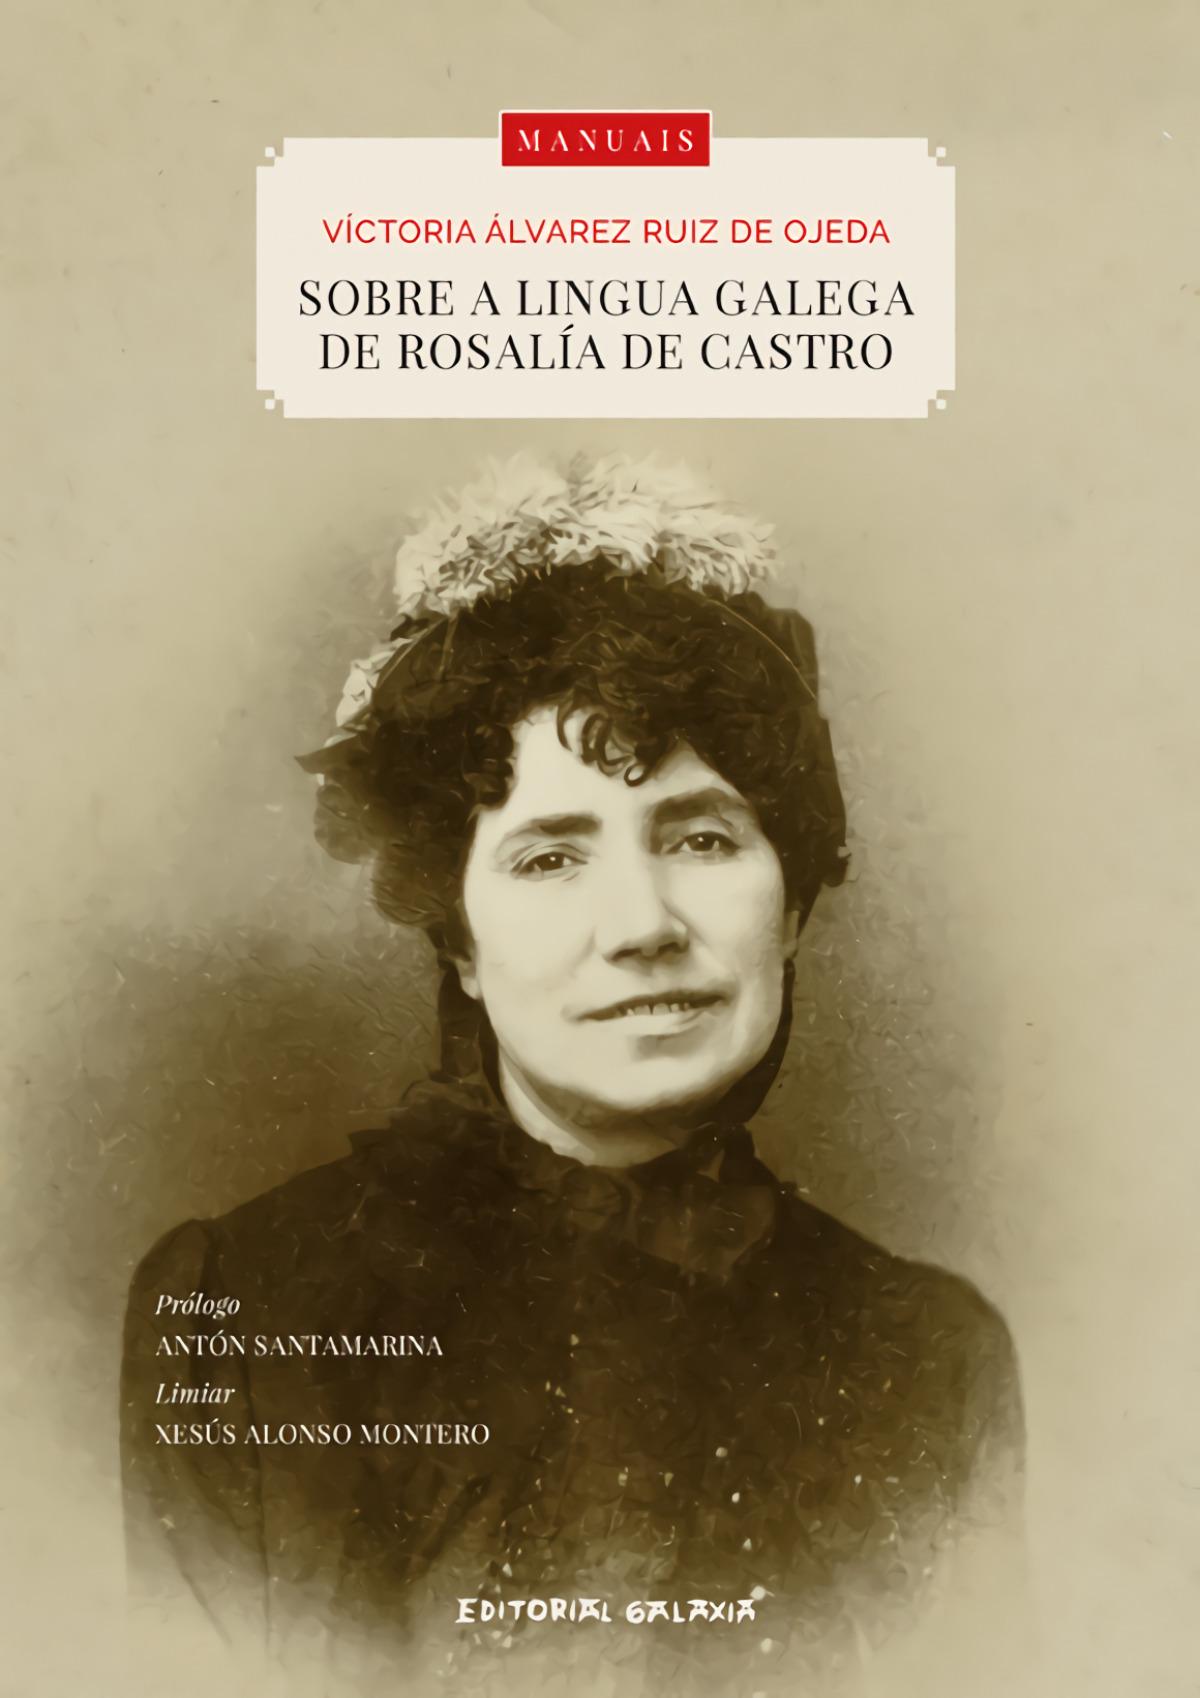 Sobre a lingua galega de Rosalía de Castro